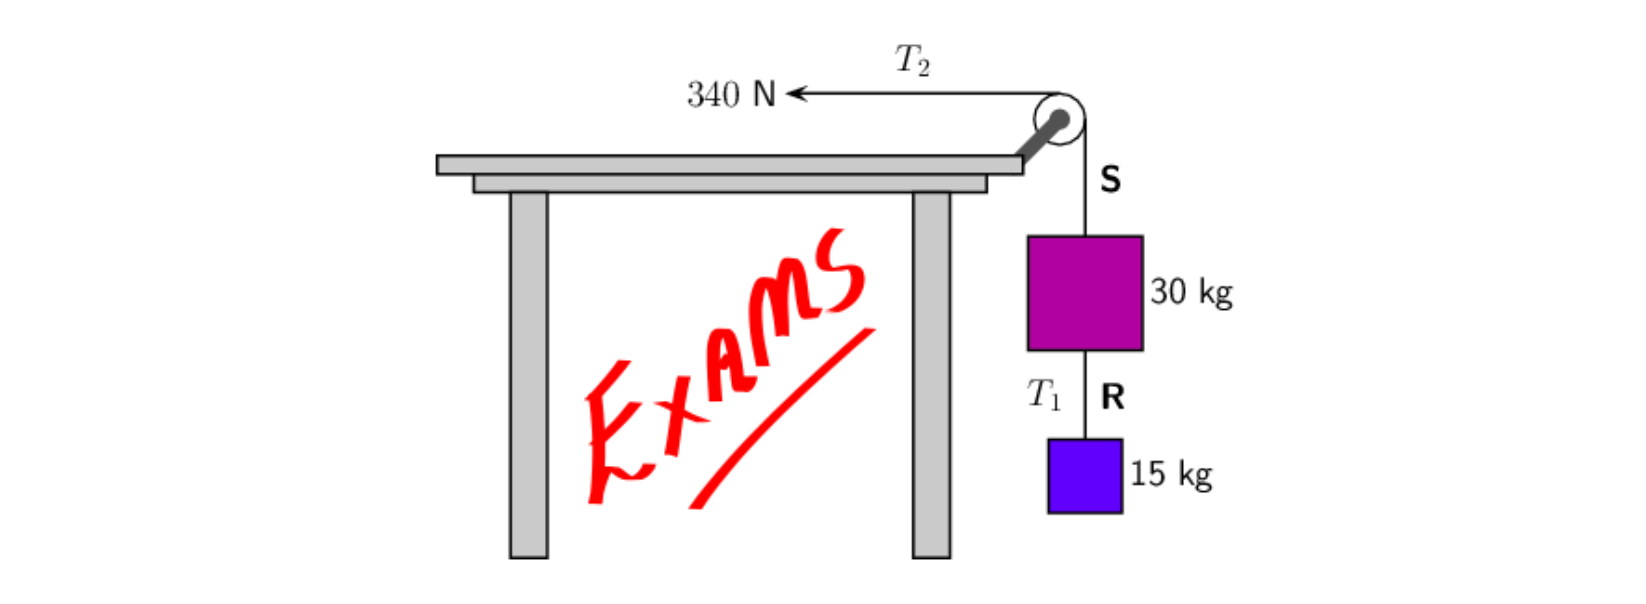 Physics exam questions